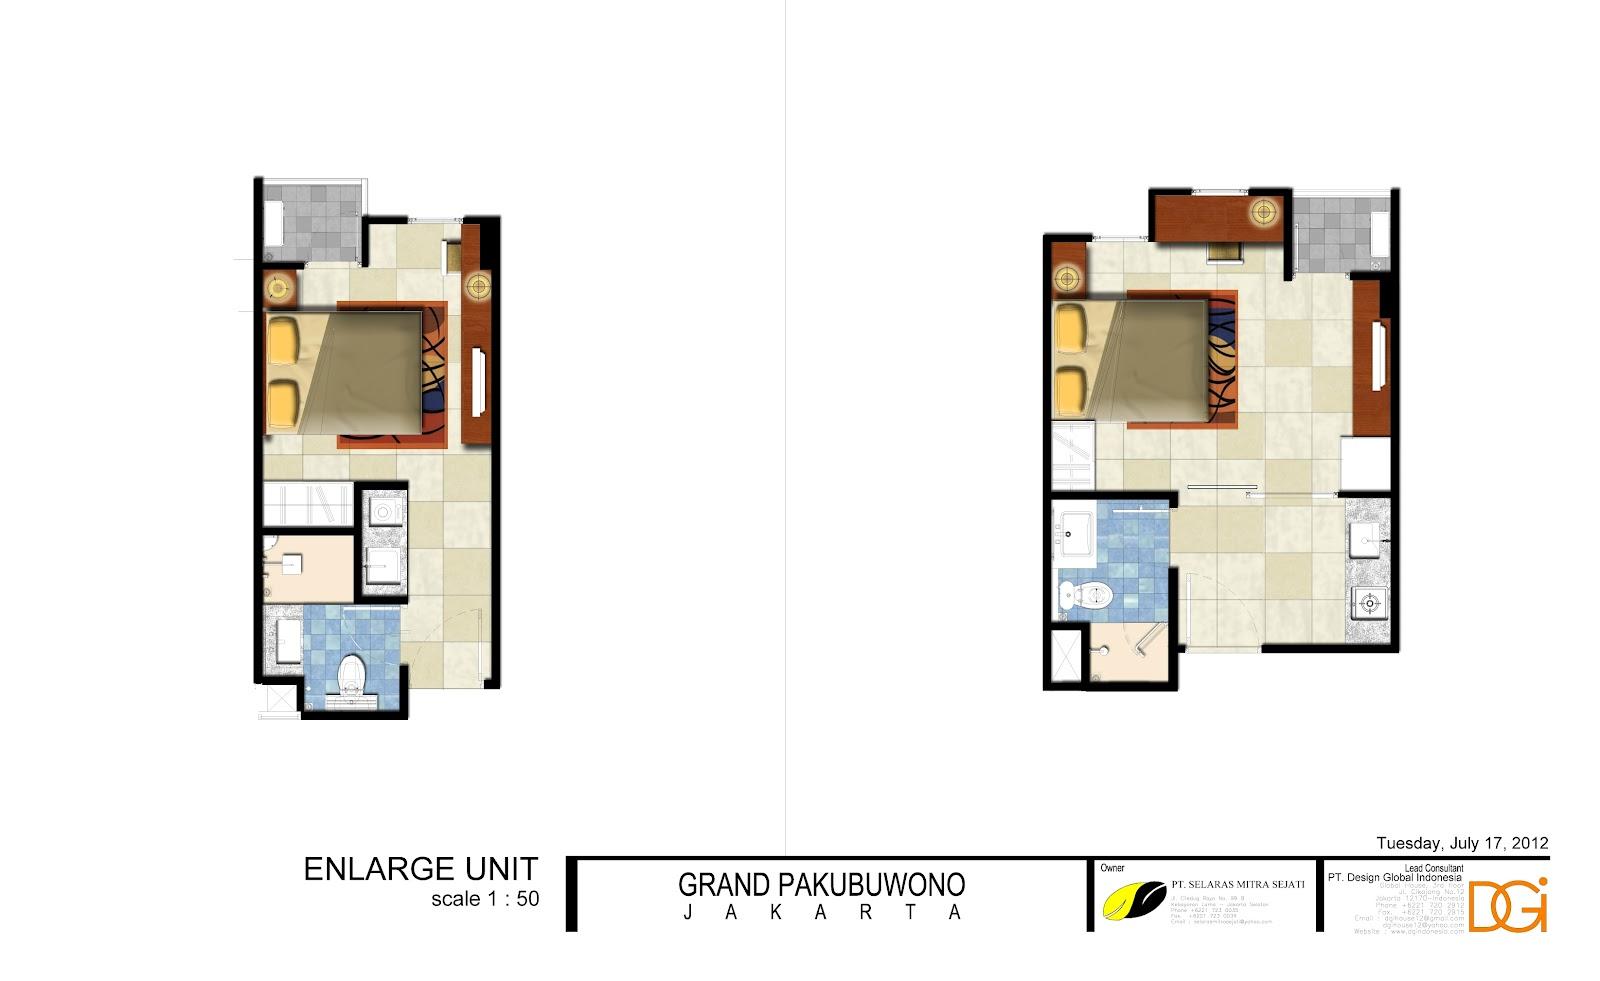 grand pakubuwono terrace apartment. Black Bedroom Furniture Sets. Home Design Ideas